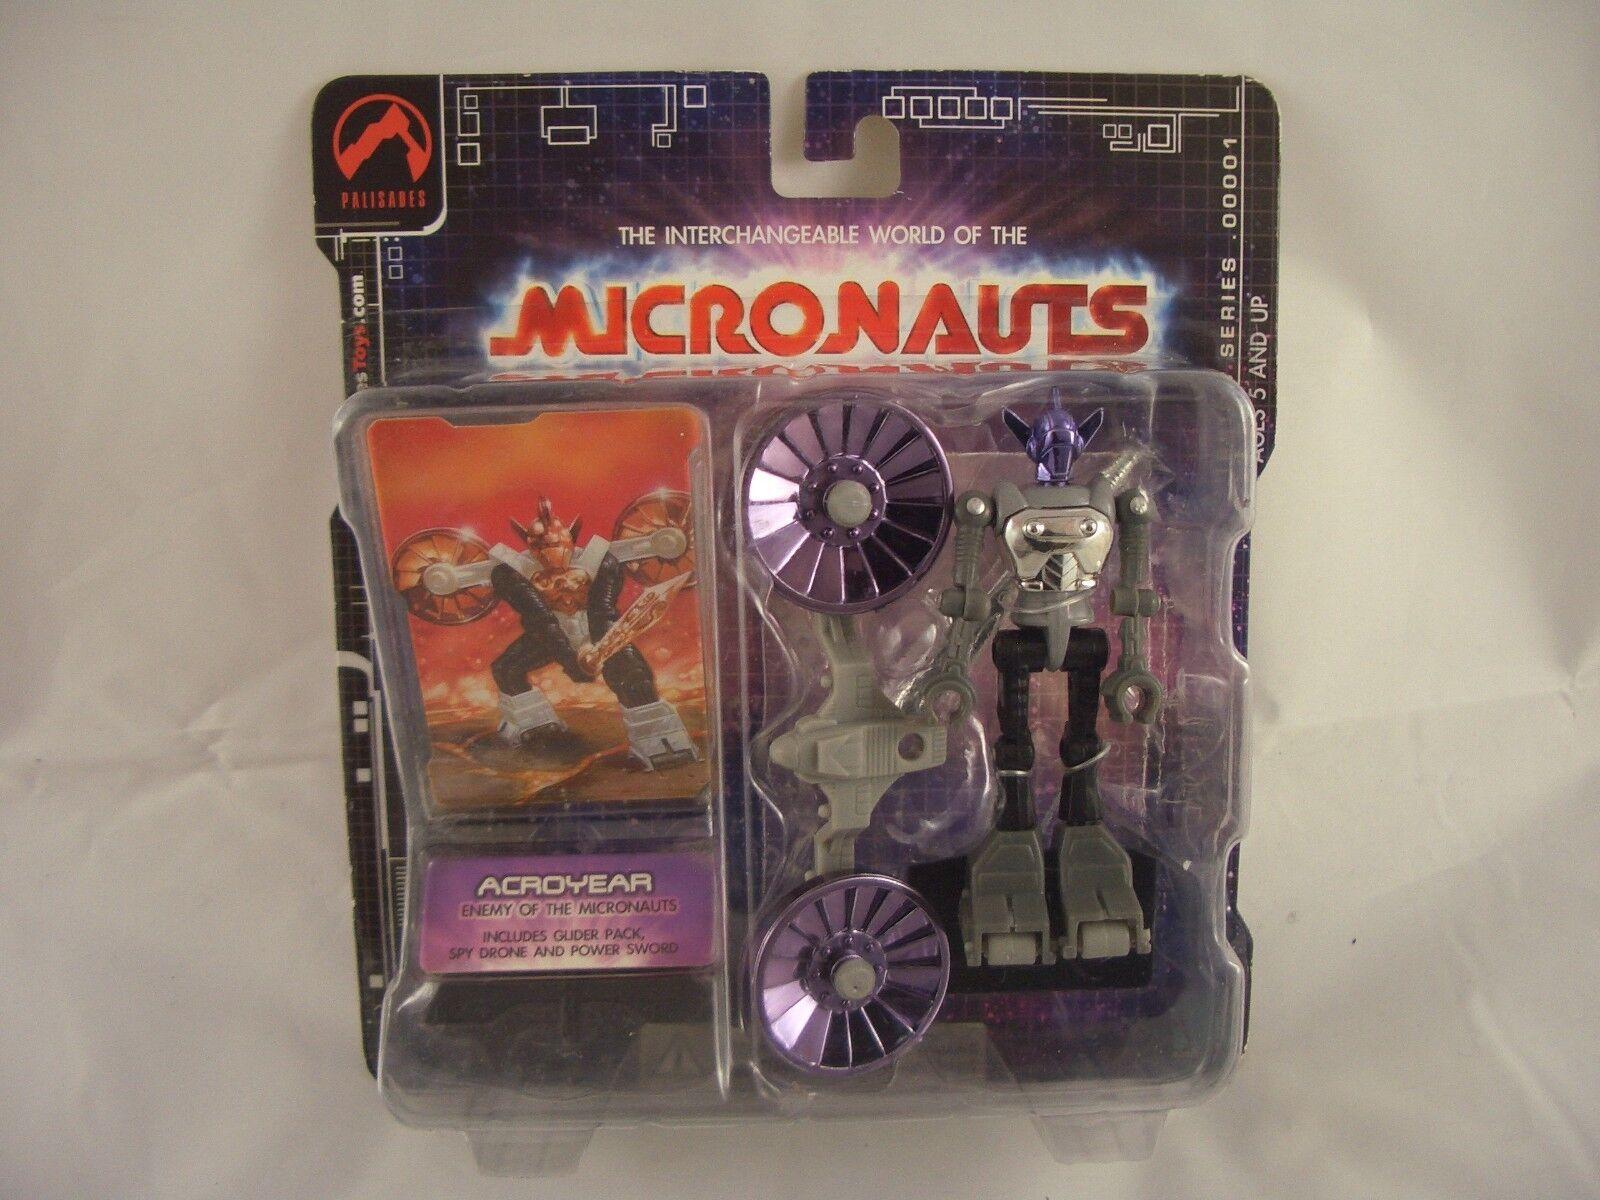 MICRONAUTS  PALISADES Retro Series Acroyear lila/Grau Action figure